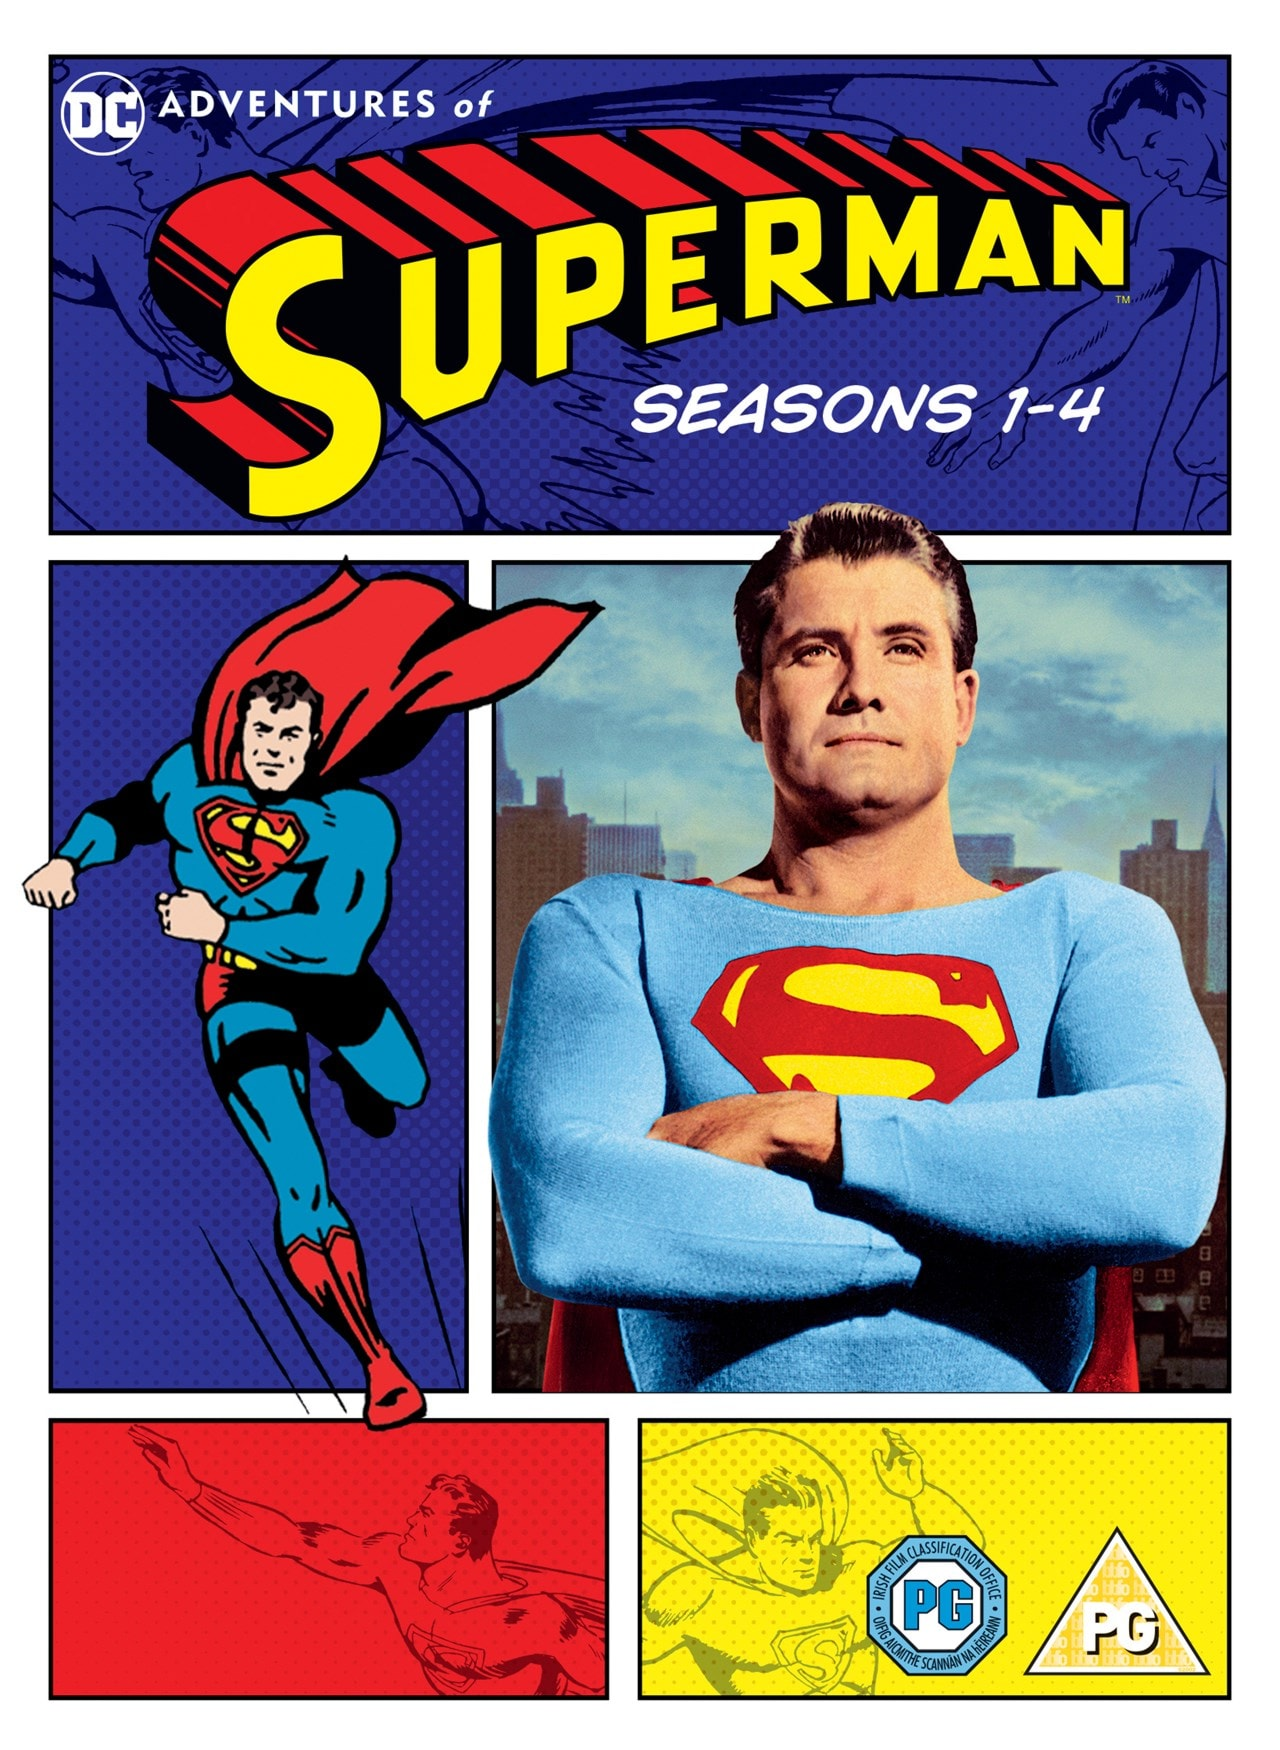 Adventures of Superman: Seasons 1-4 - 1